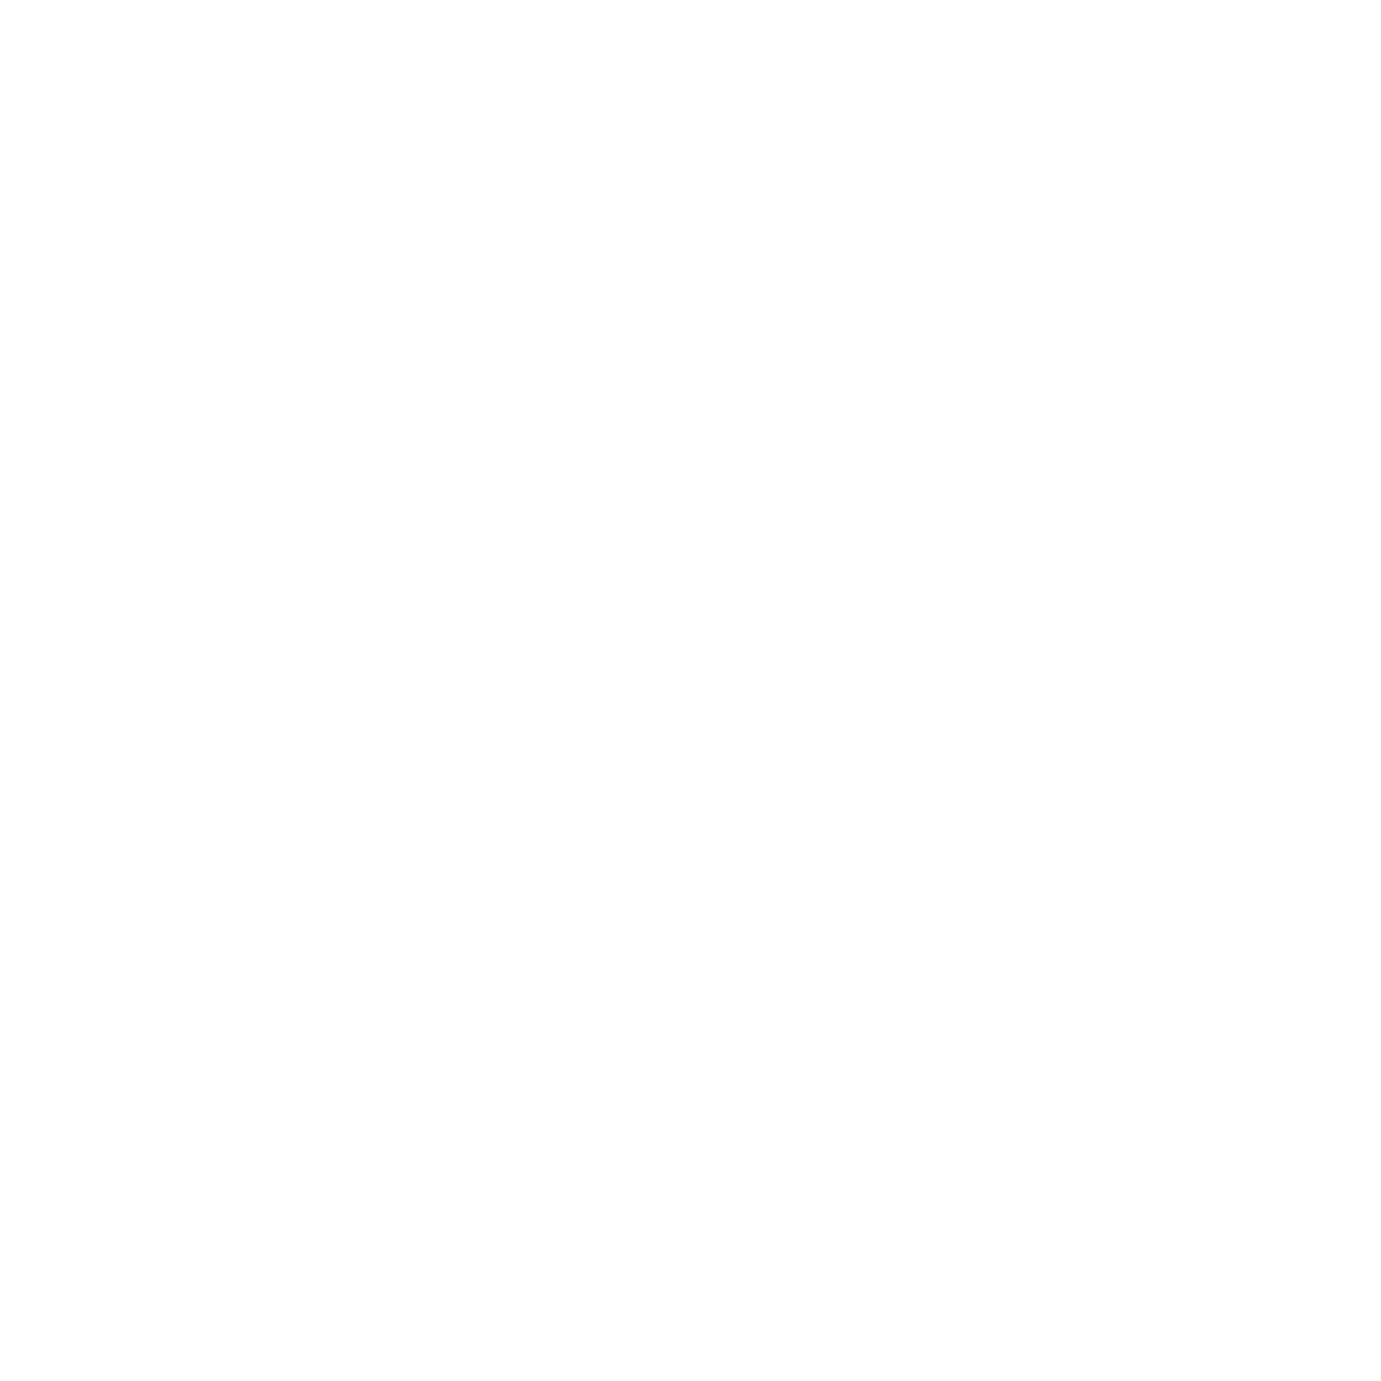 Maillot vélo marinière coolmax blanc